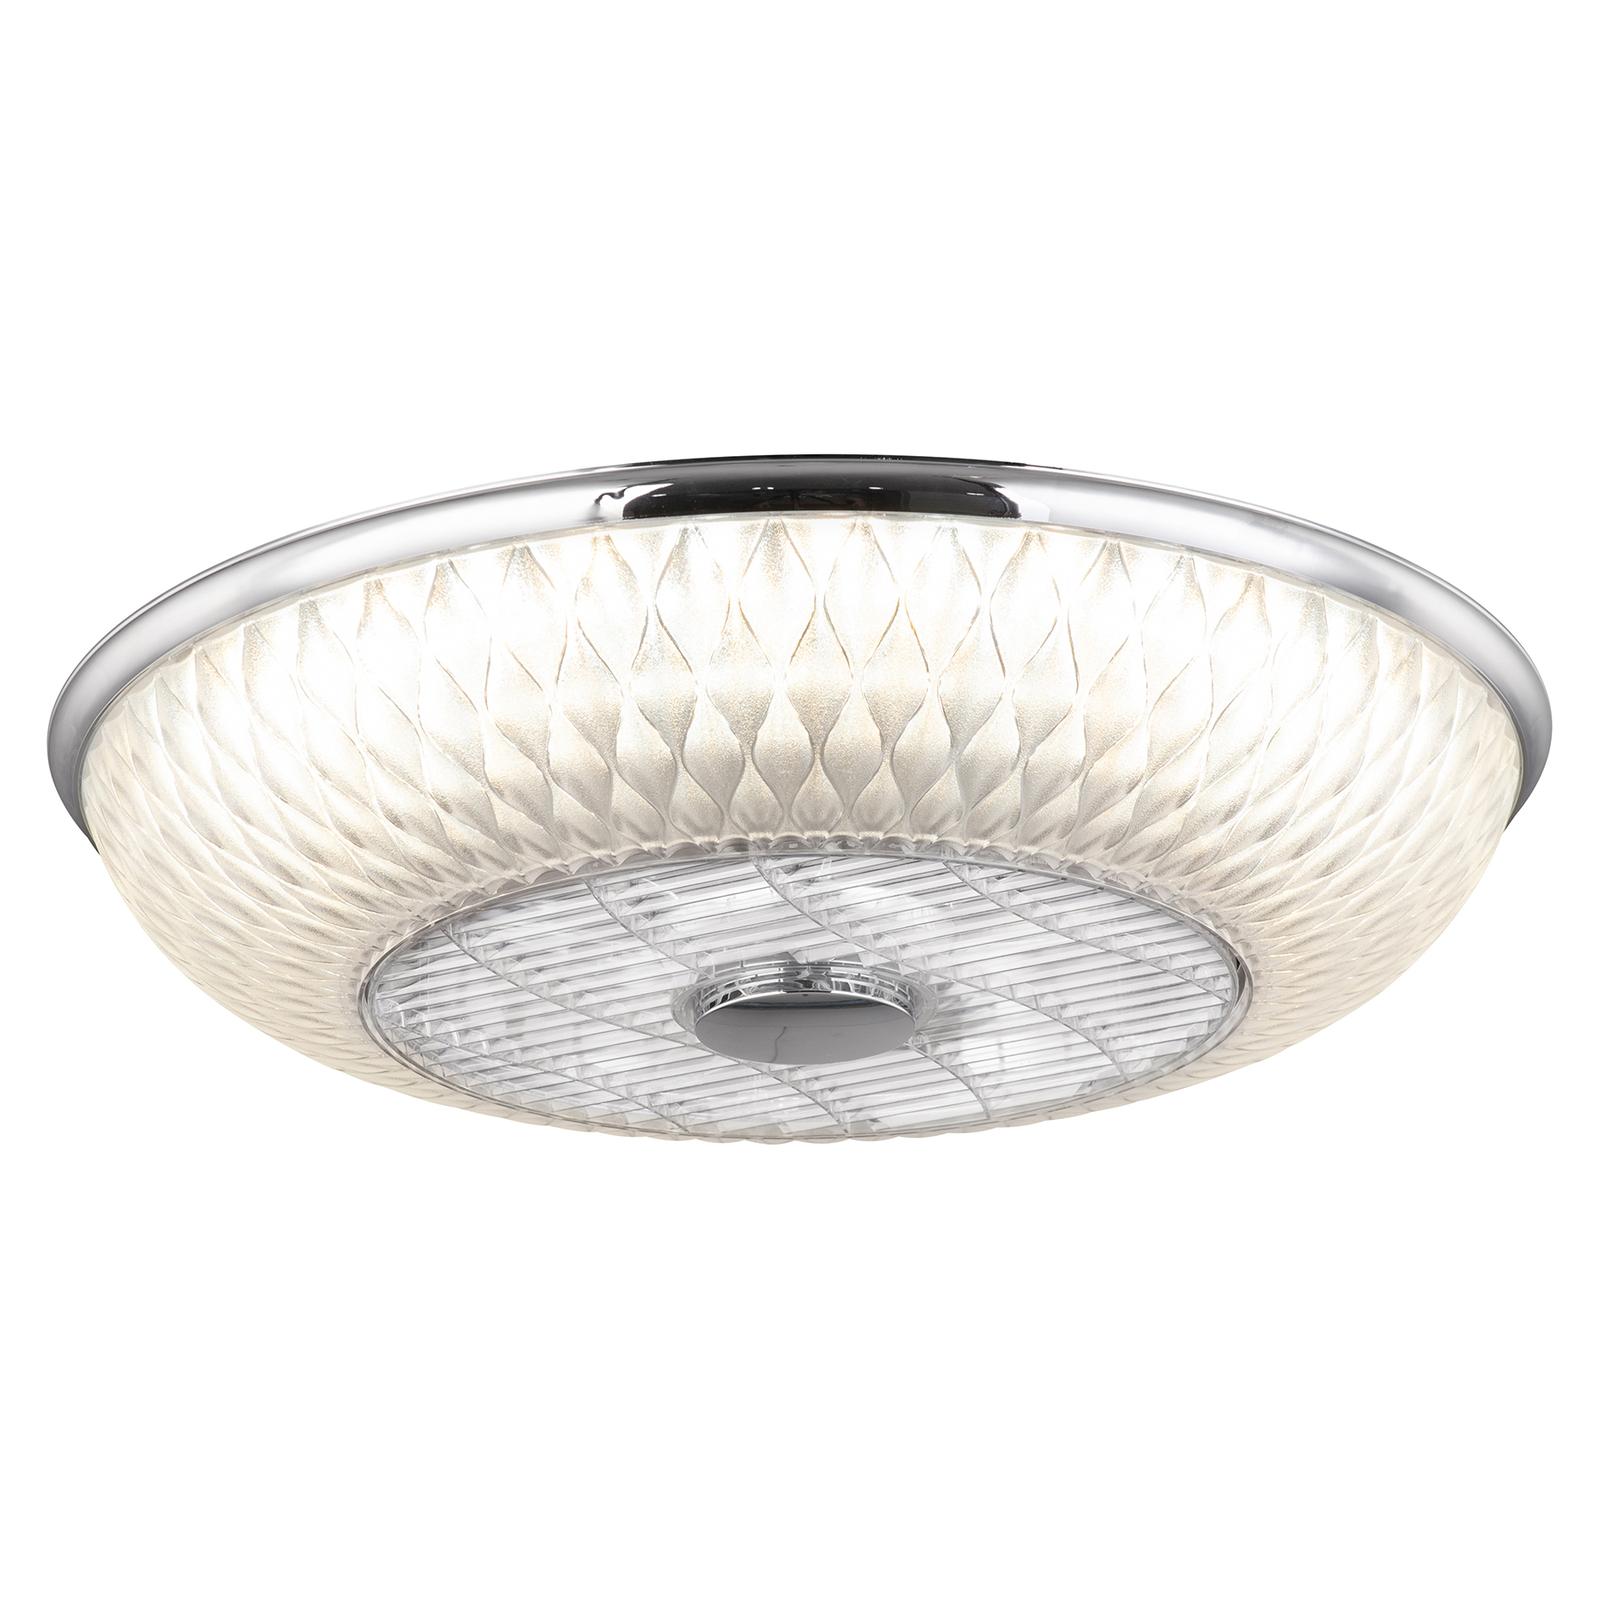 LED-Deckenventilator Rosario, weiß-chrom